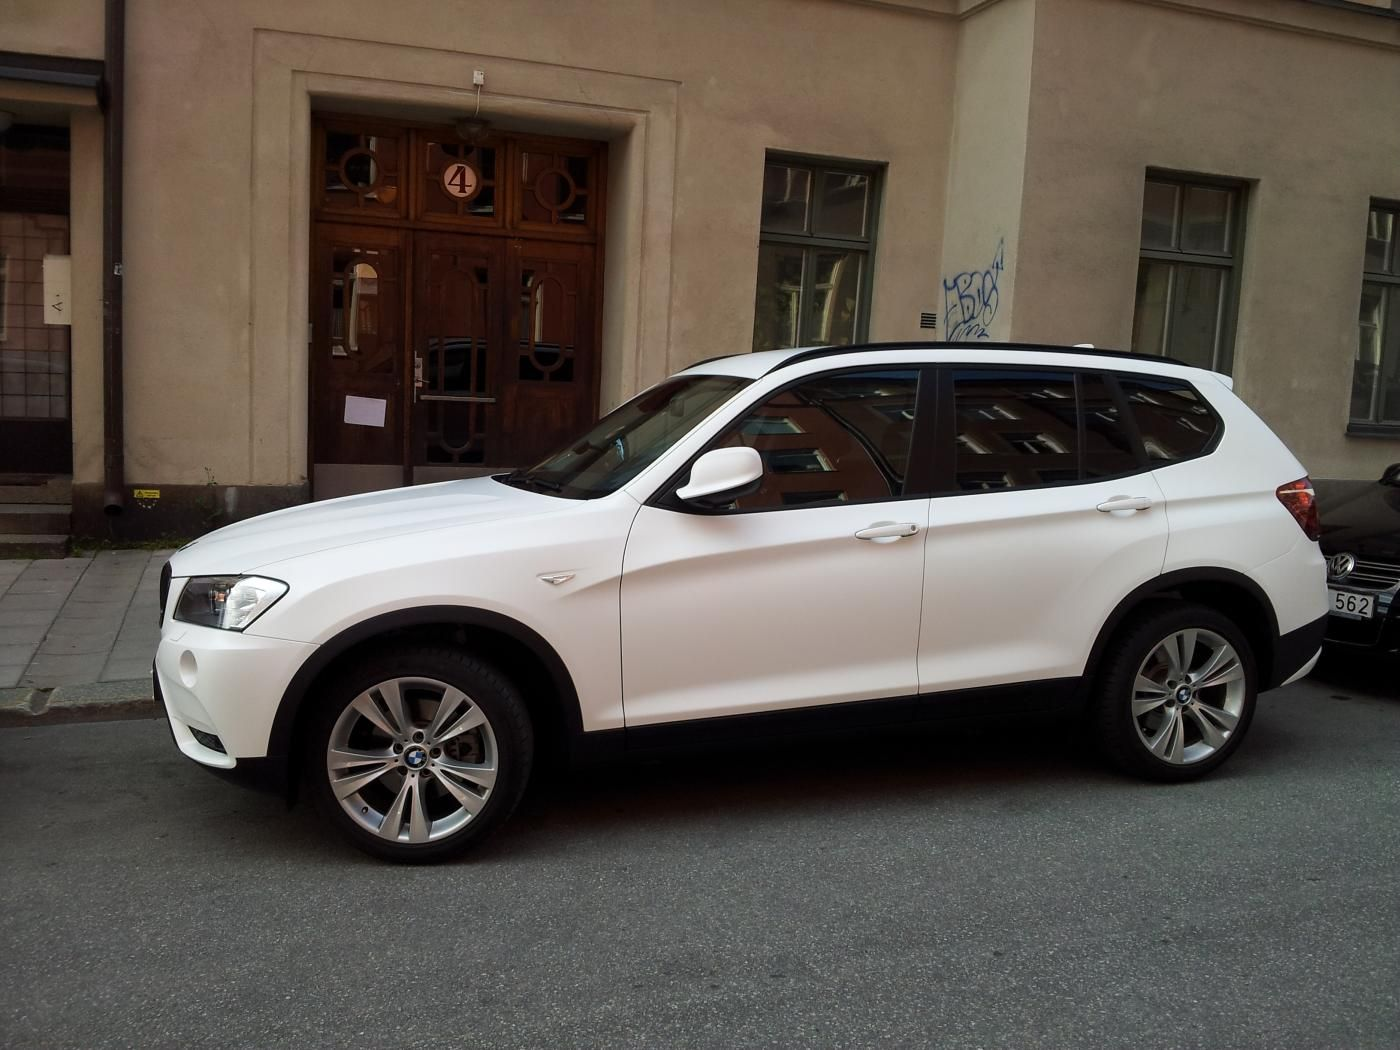 Matte White X3 Xbimmers Bmw X3 Forum Bmw X3 Cars